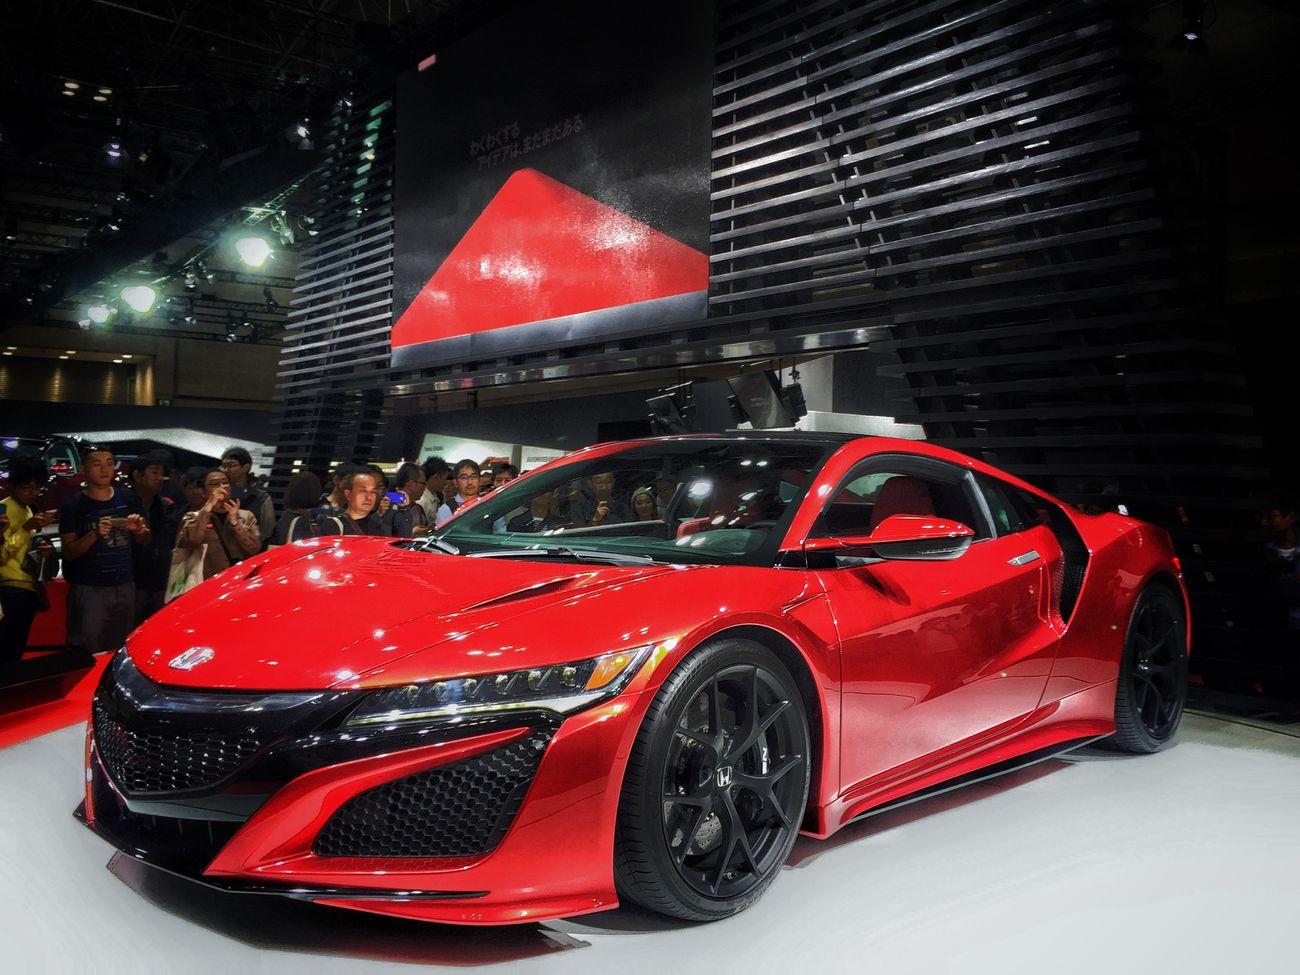 Pure red❤️ Tokyomotorshow2015 東京ビッグサイト Red Nsx Honda Sportscar Enjoying Life 大人の休日 Happytime EyeEmBestPics